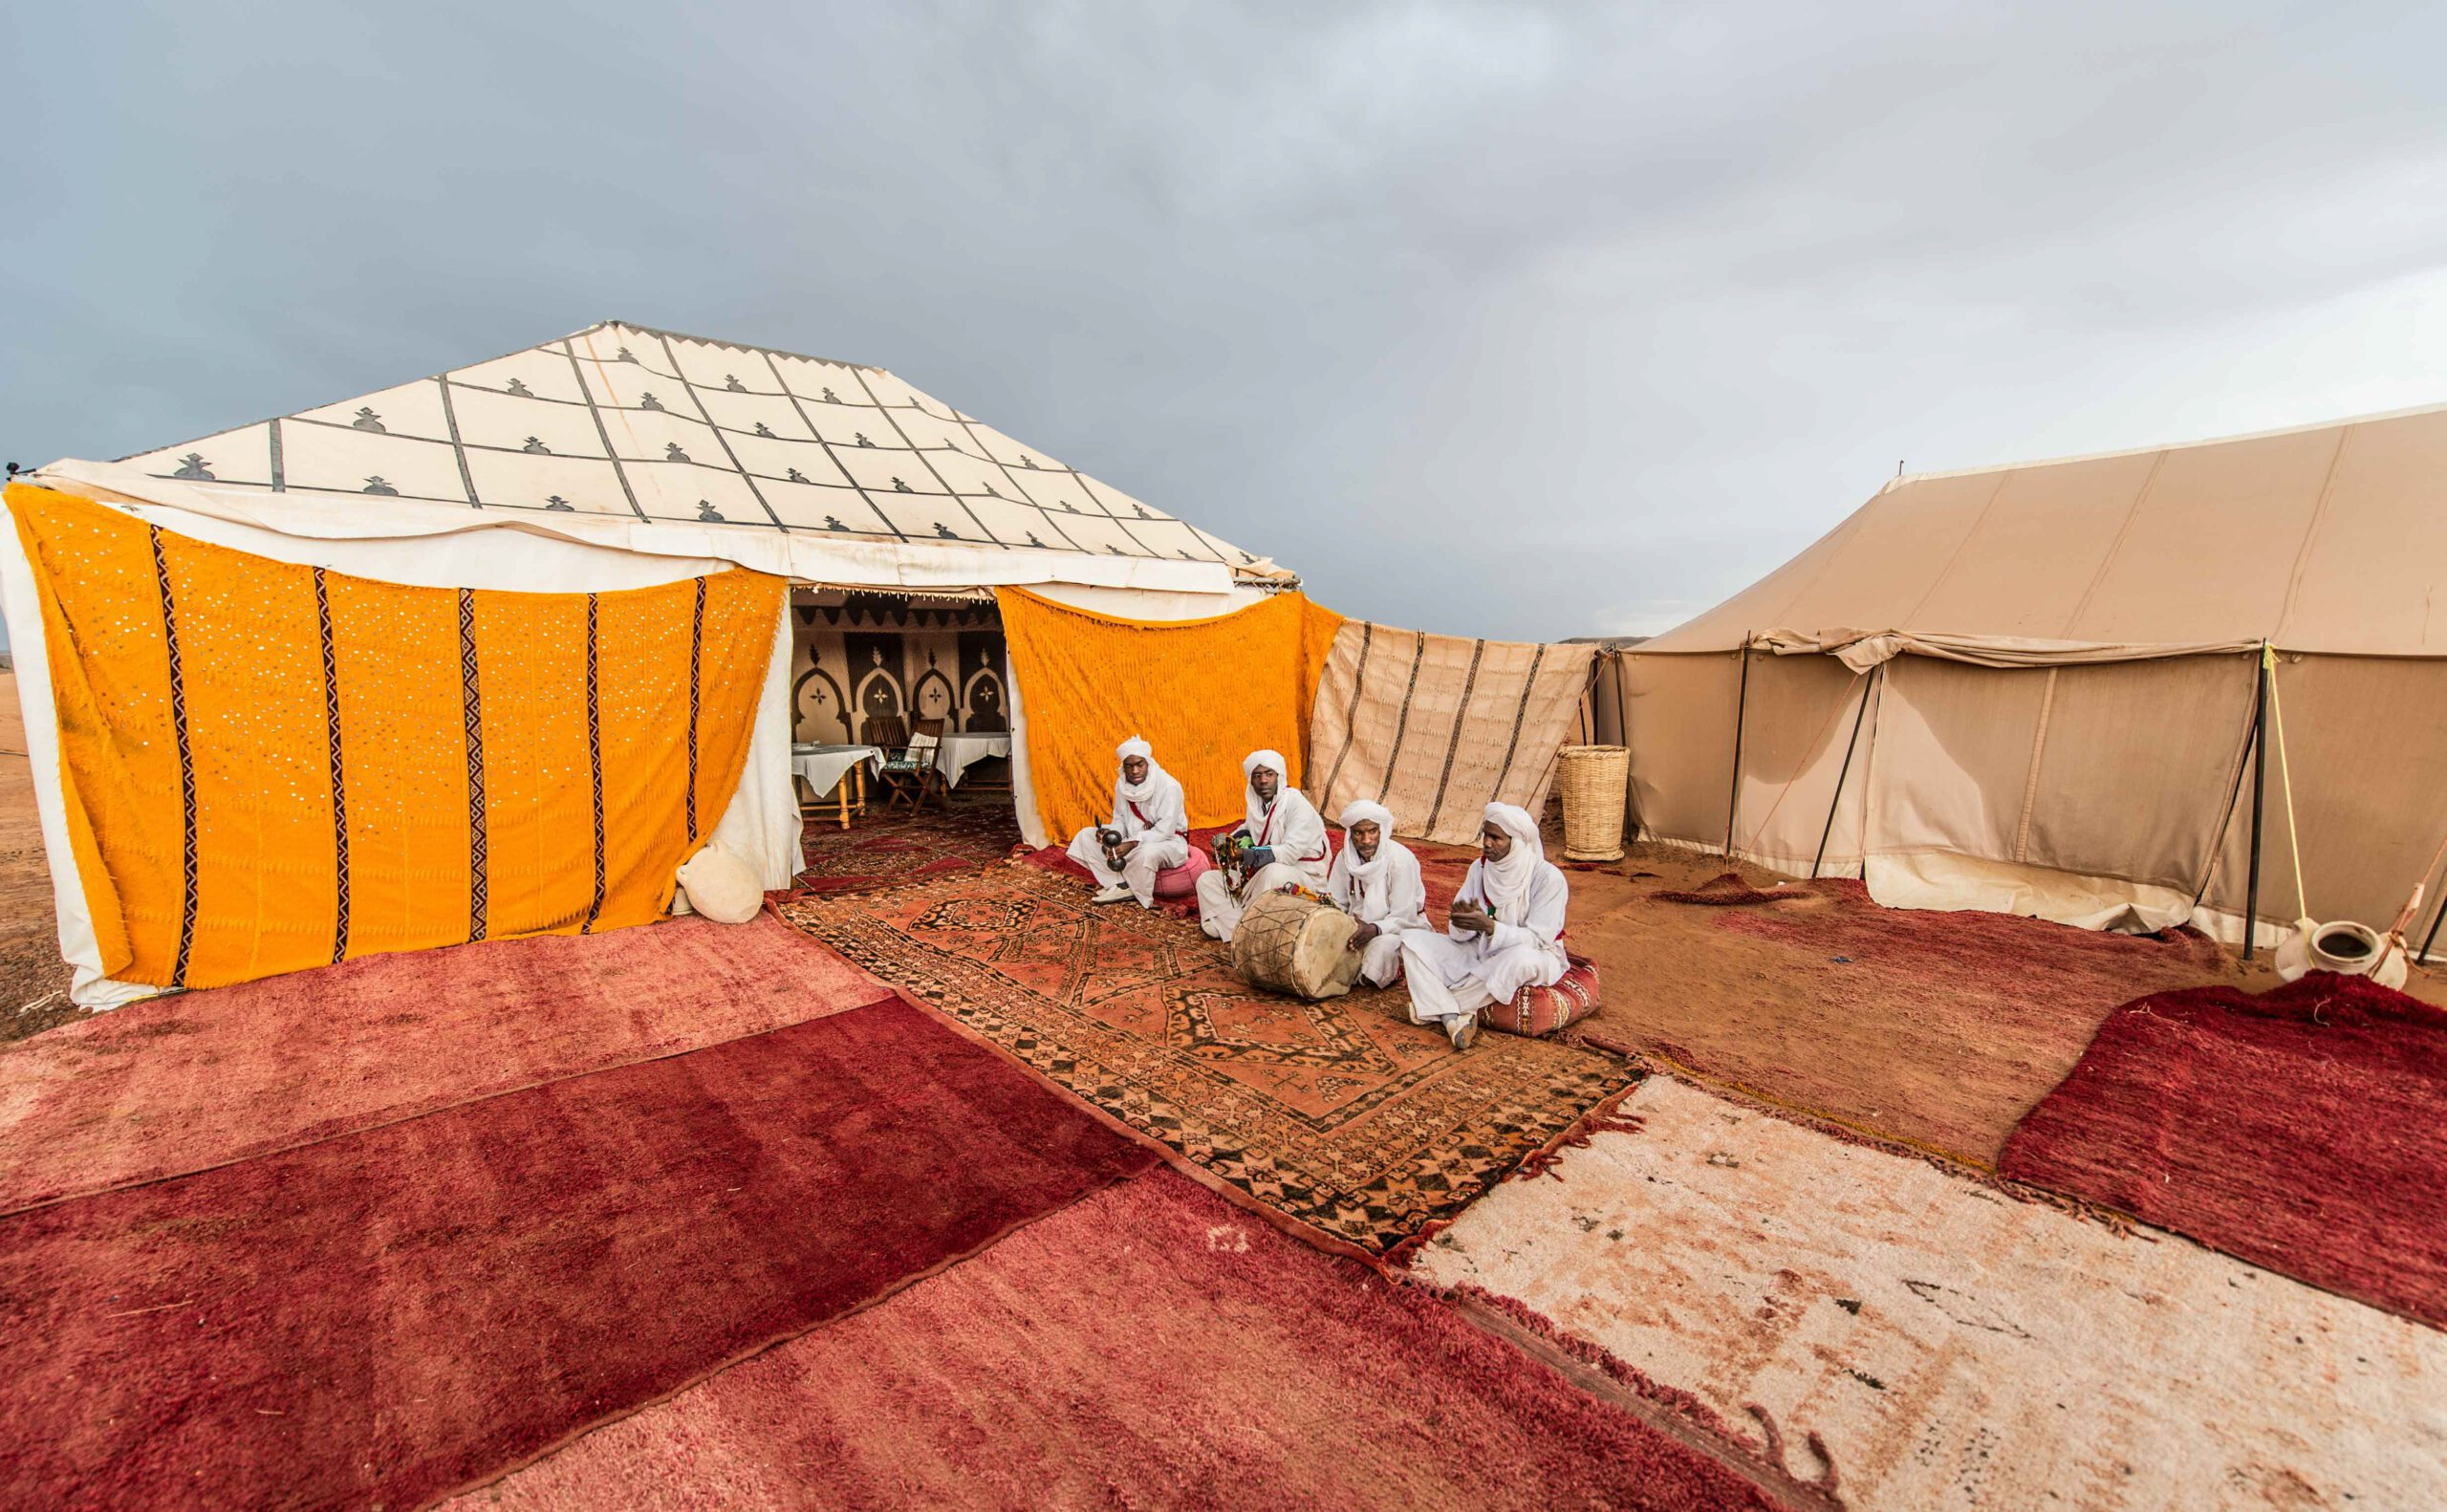 desert camp exterior view